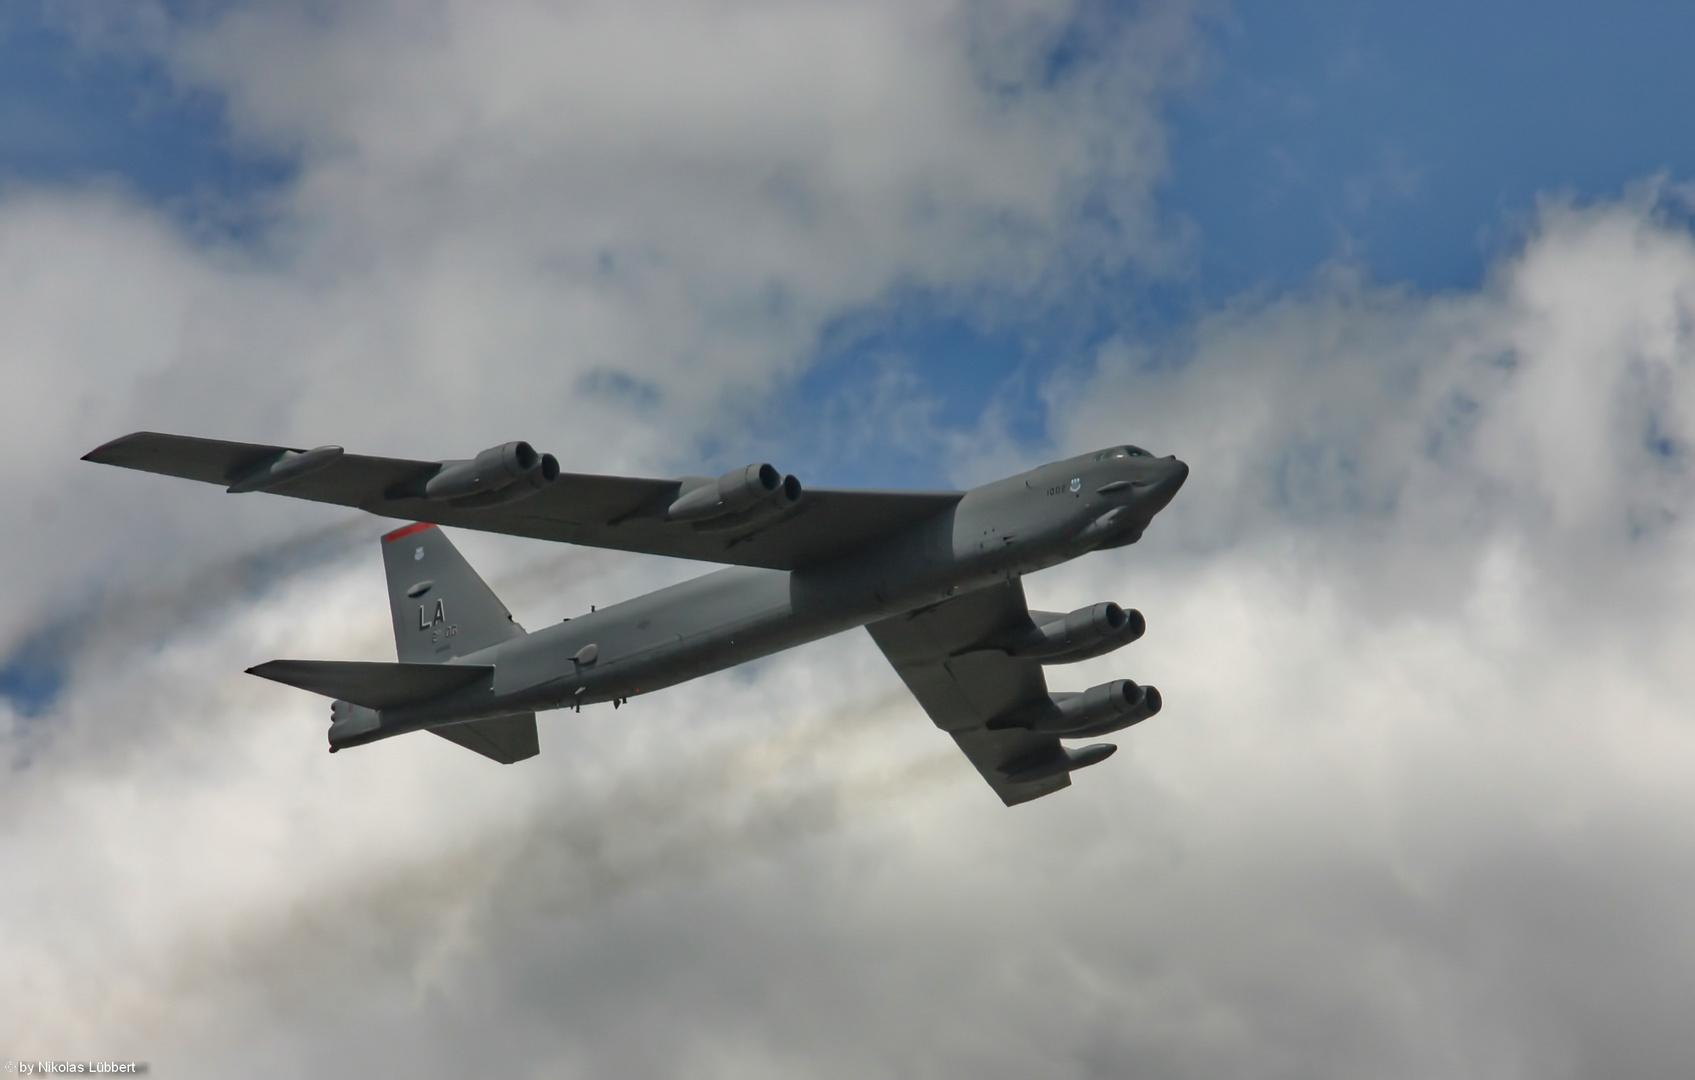 B-52 at Farnborough-Airshow